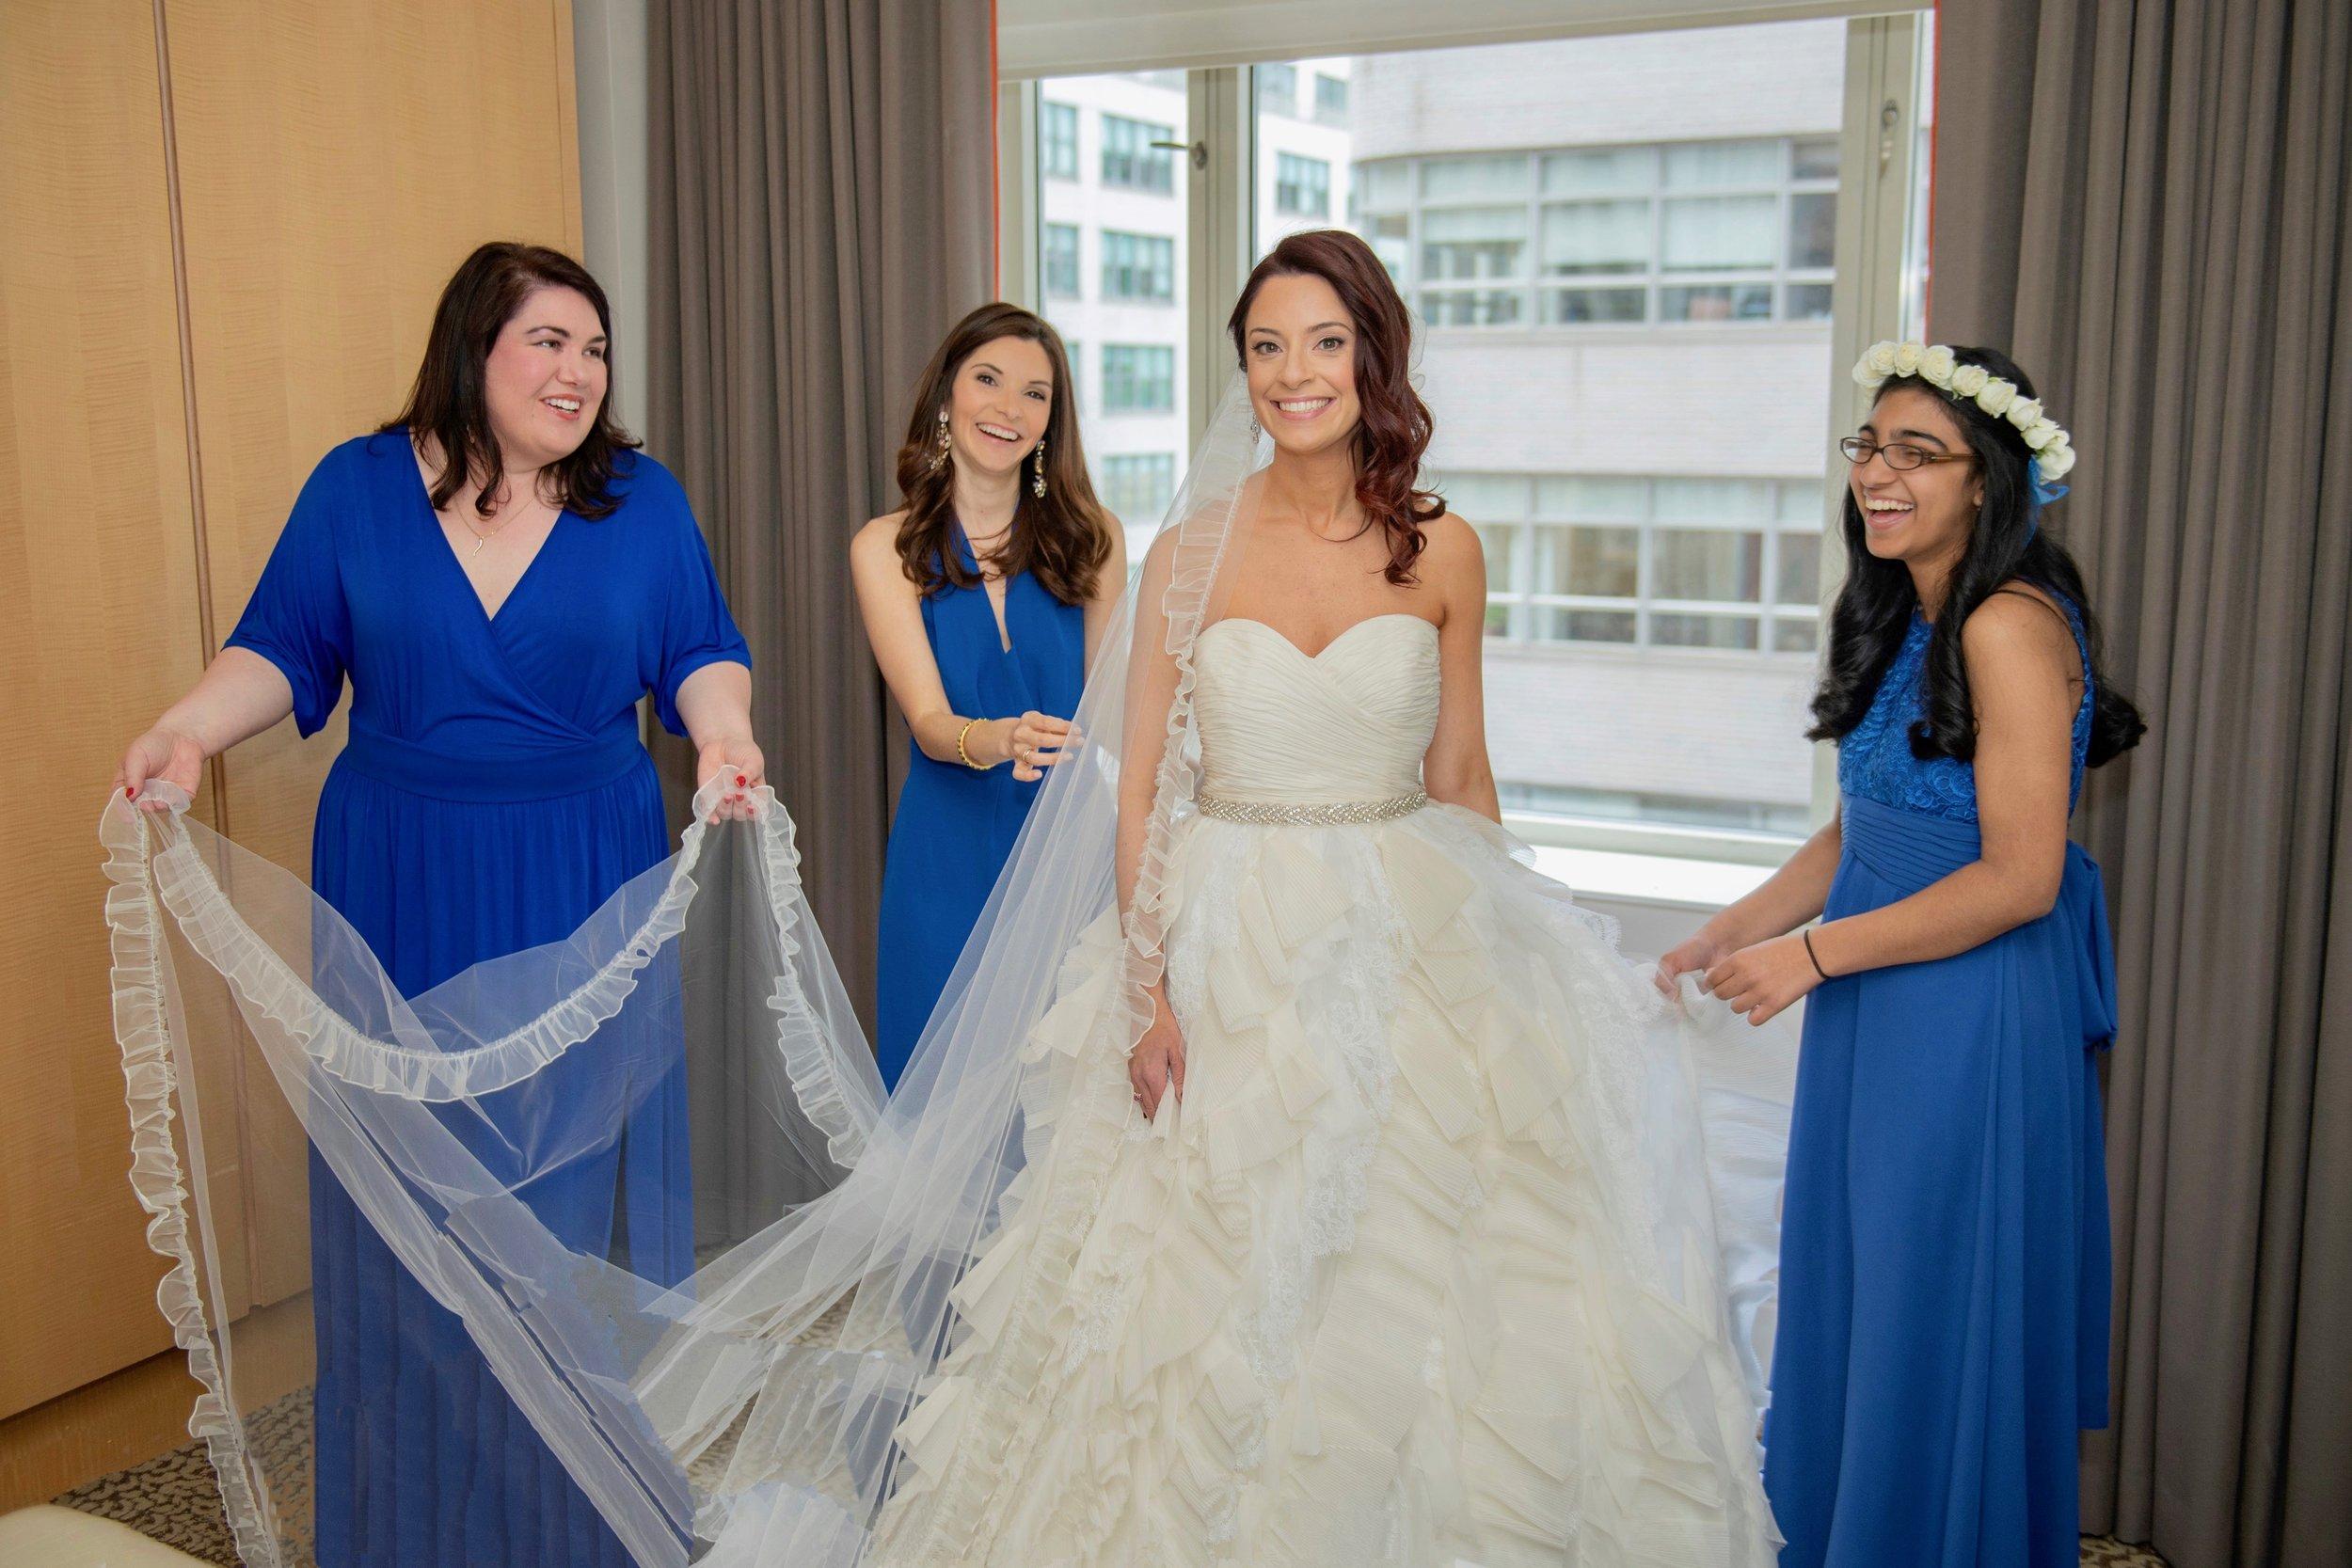 Barbara&GiribyUnveiled-Weddings.com(74of1007)_Retouched.jpeg